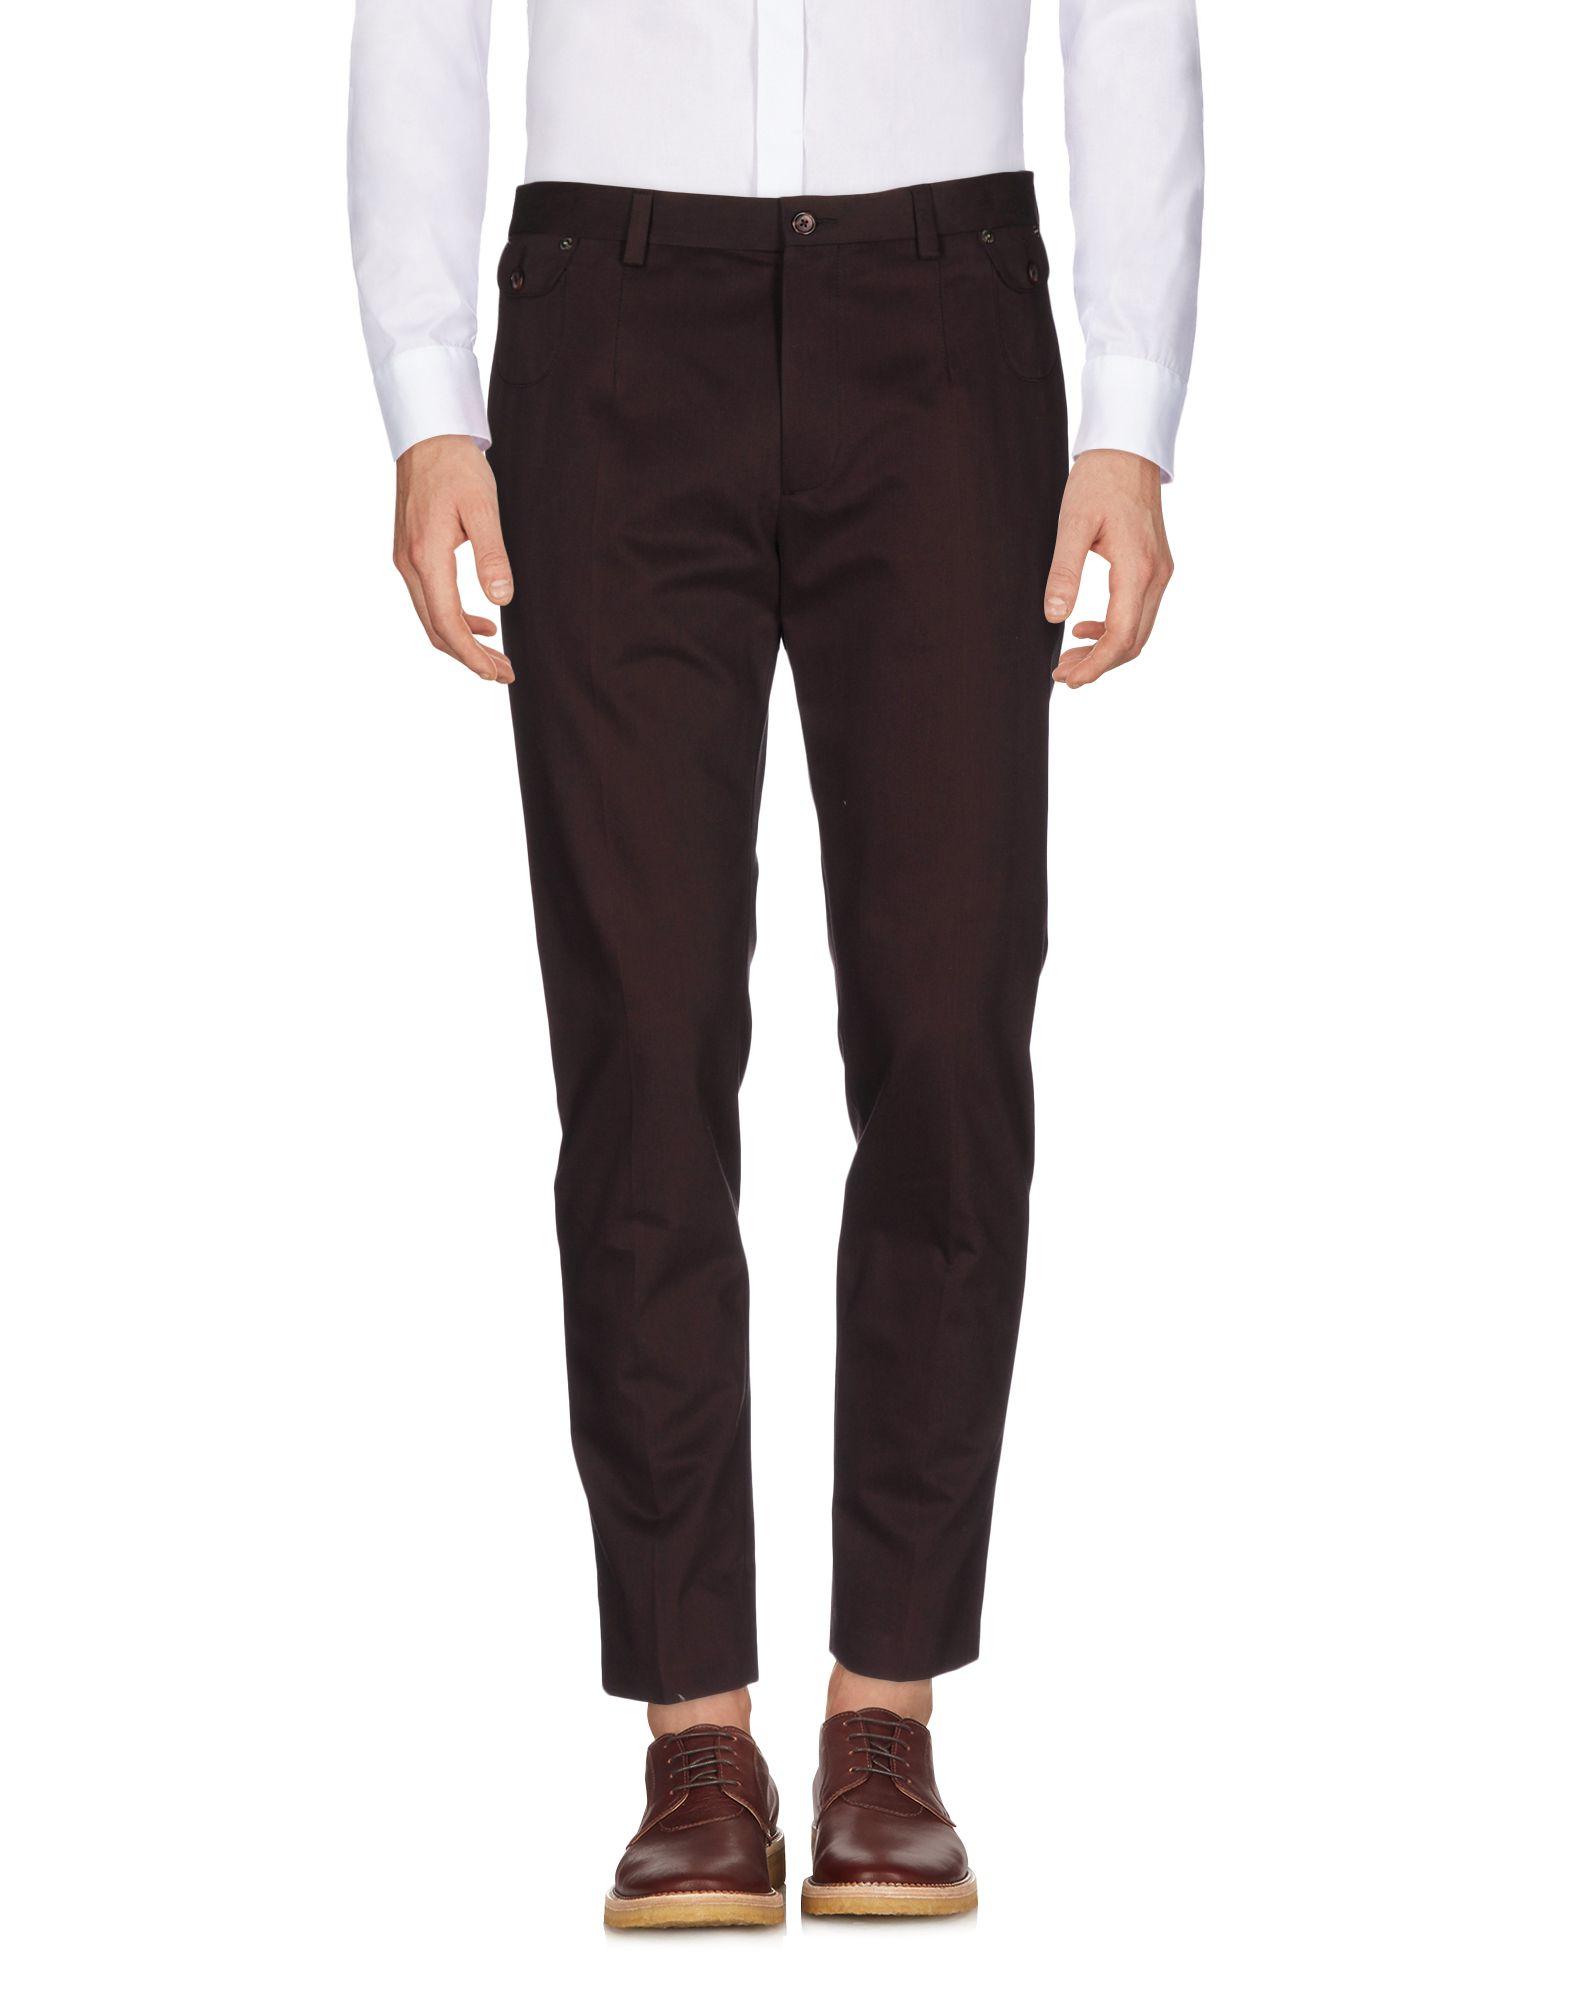 Pantalone Dolce & Gabbana Uomo - Acquista online su